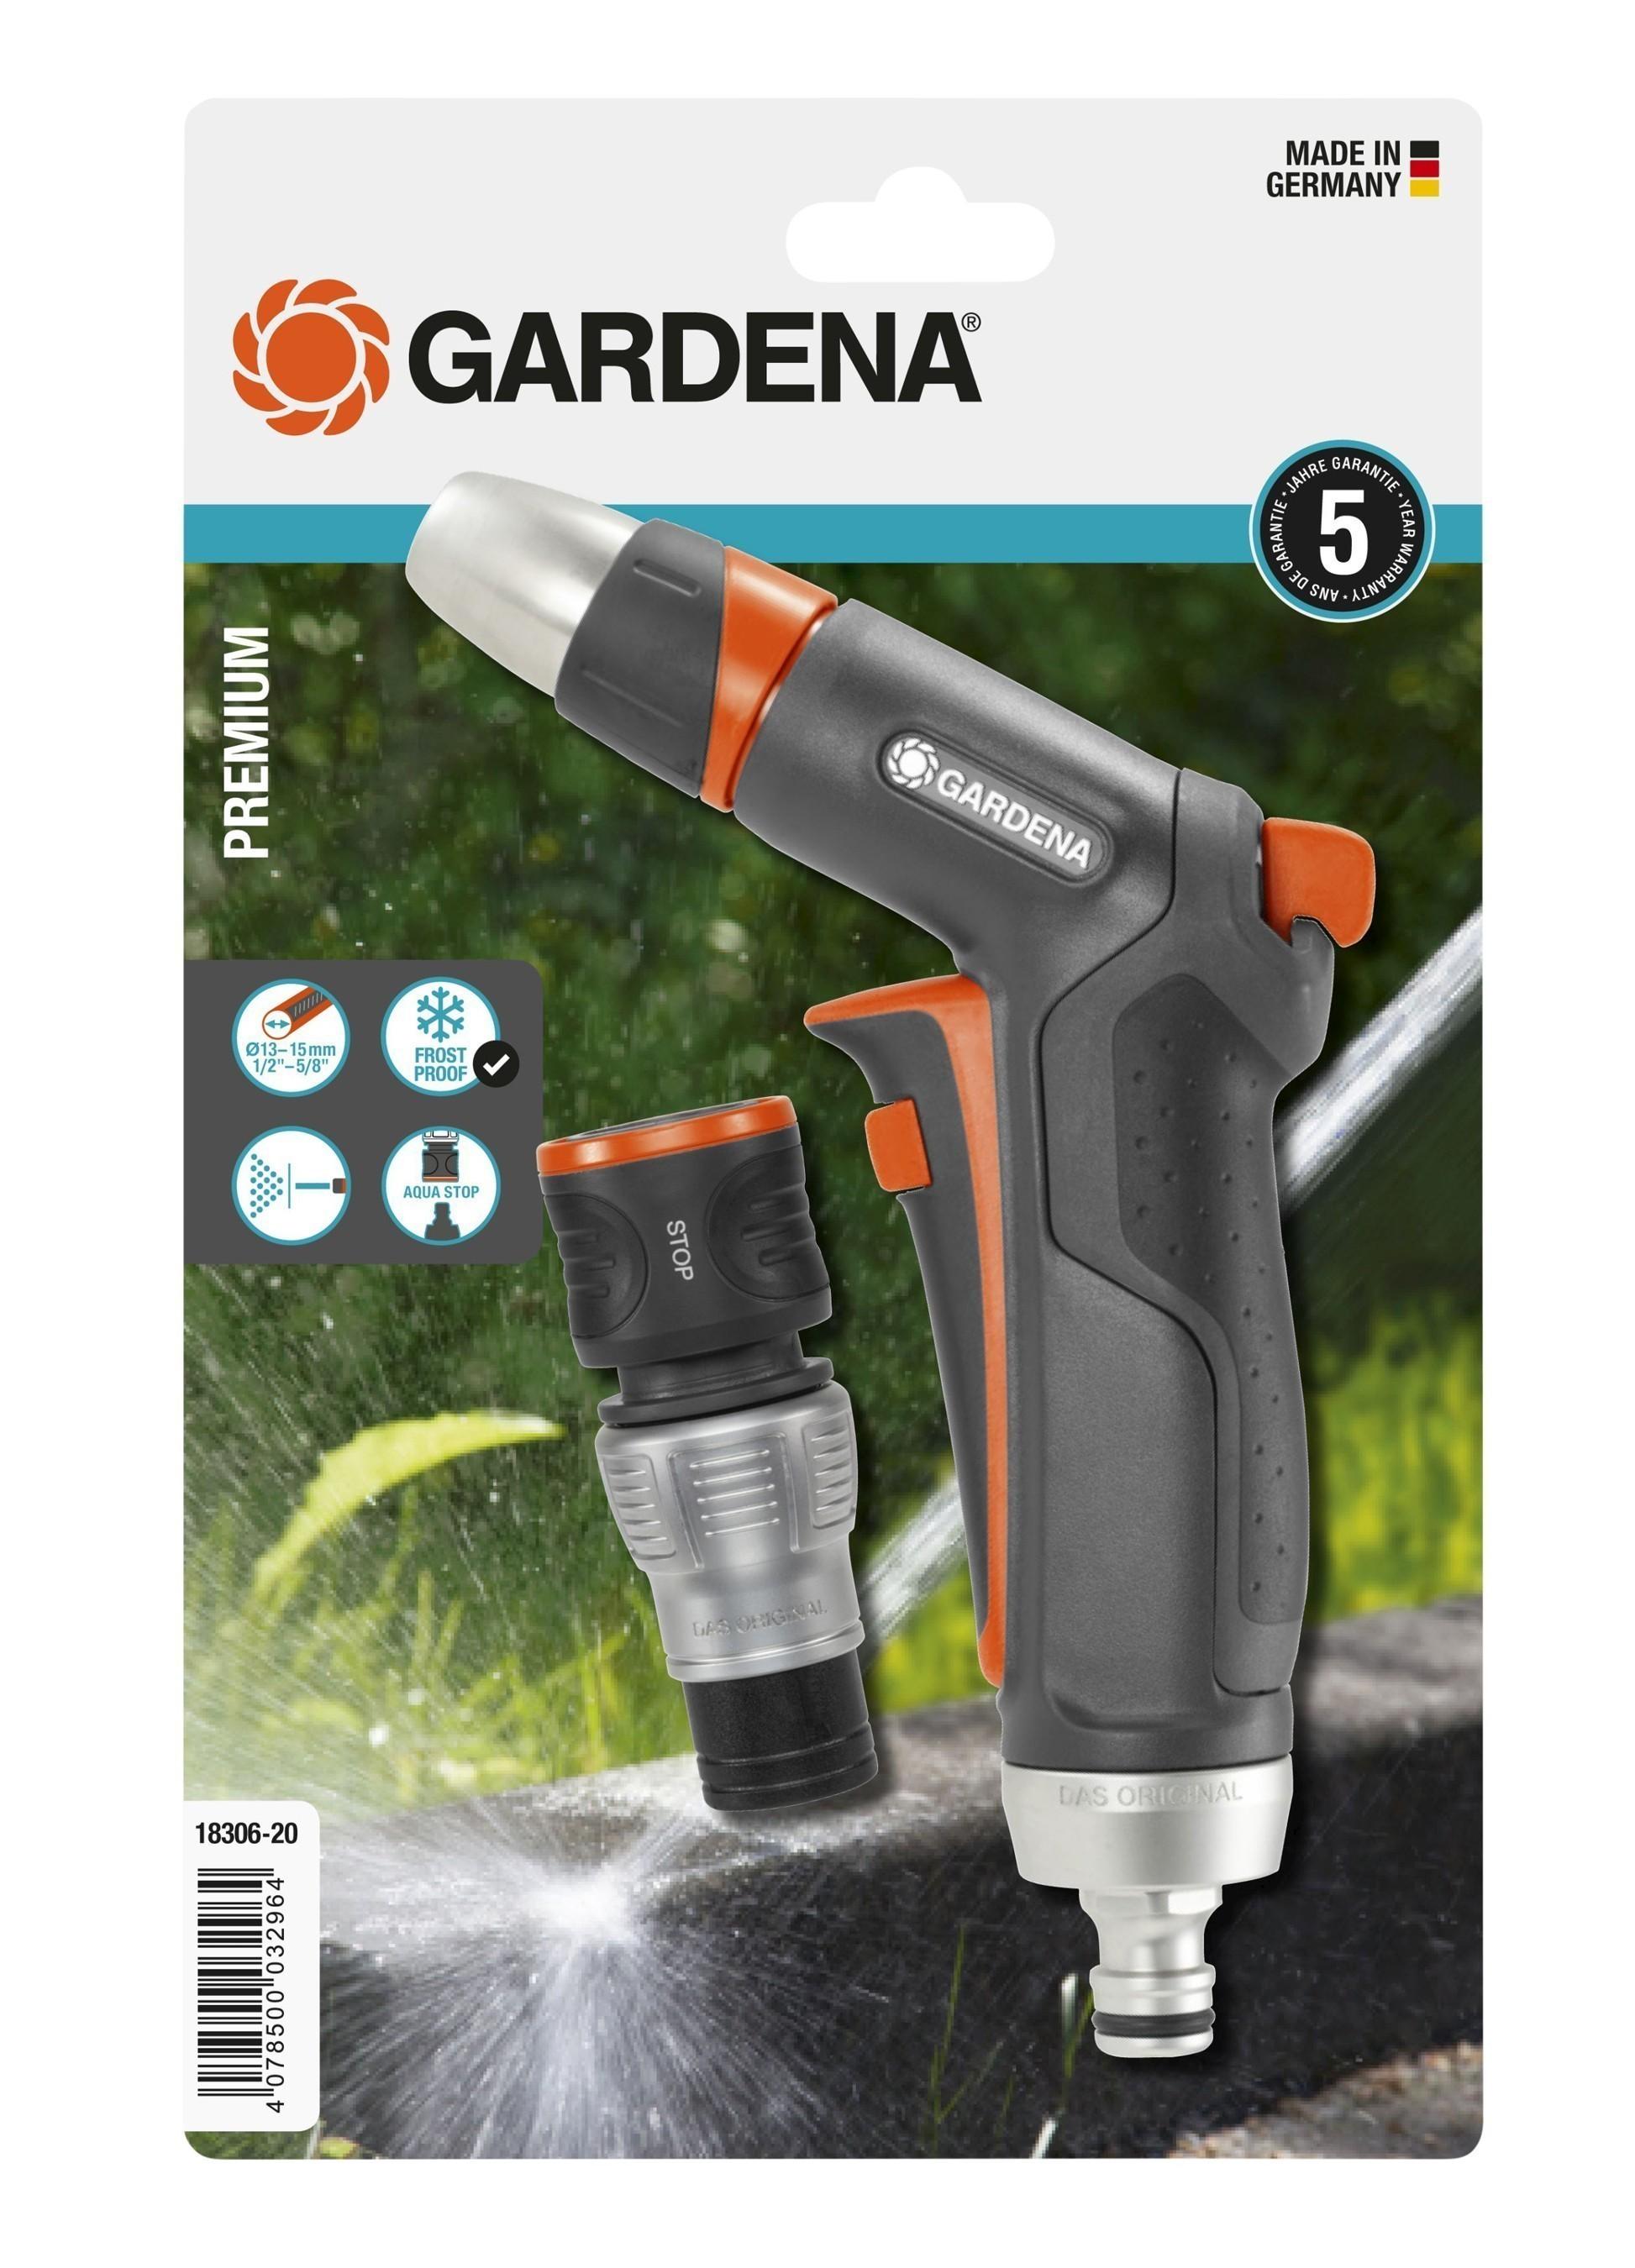 GARDENA Premium Reinigungsspritzen-Set 18306-20 Bild 1